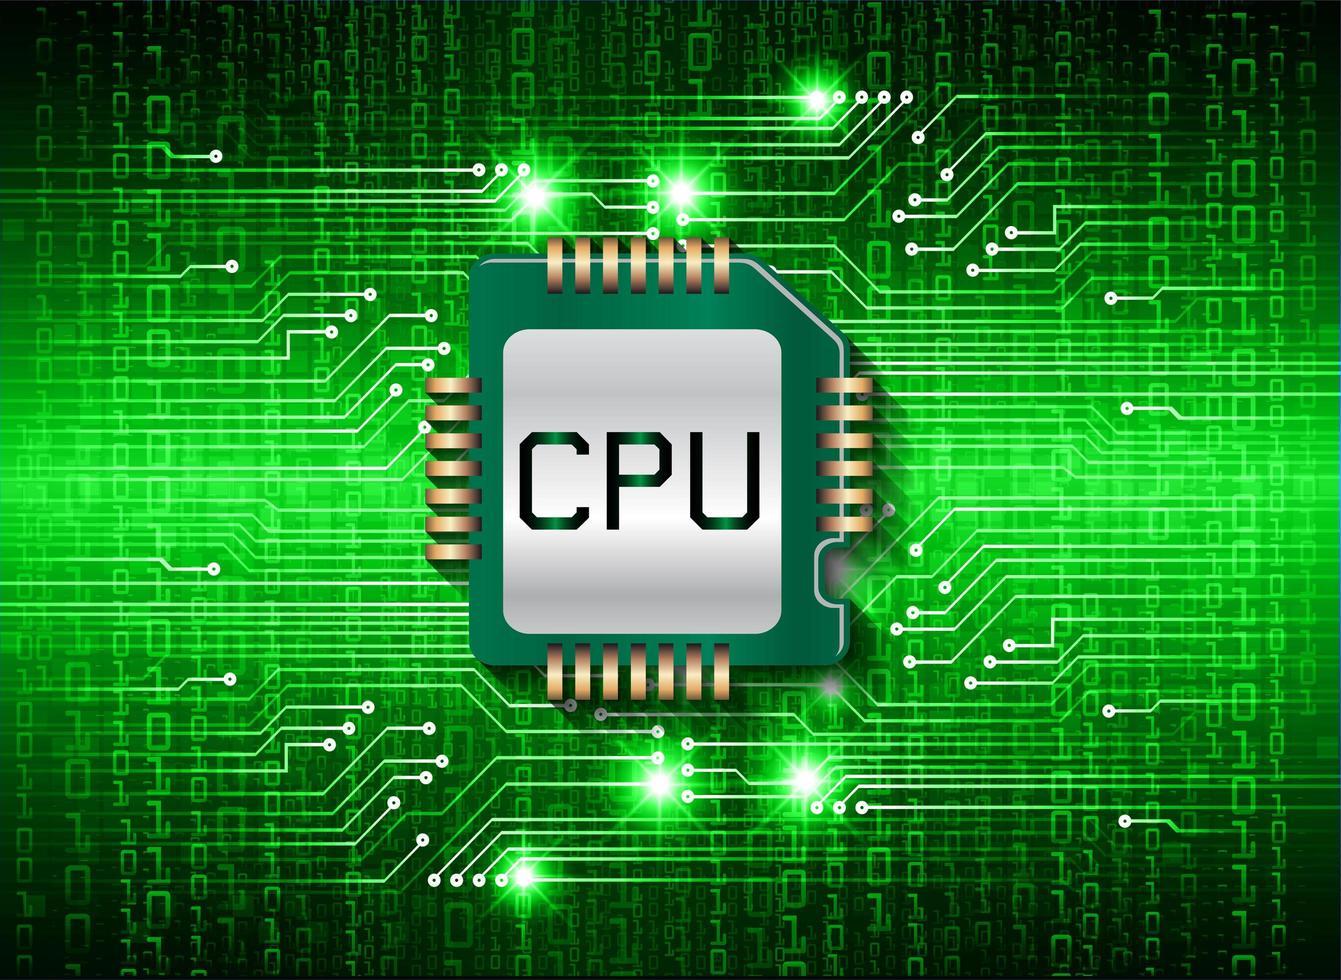 grön cpu cyber krets framtida teknik koncept bakgrund vektor